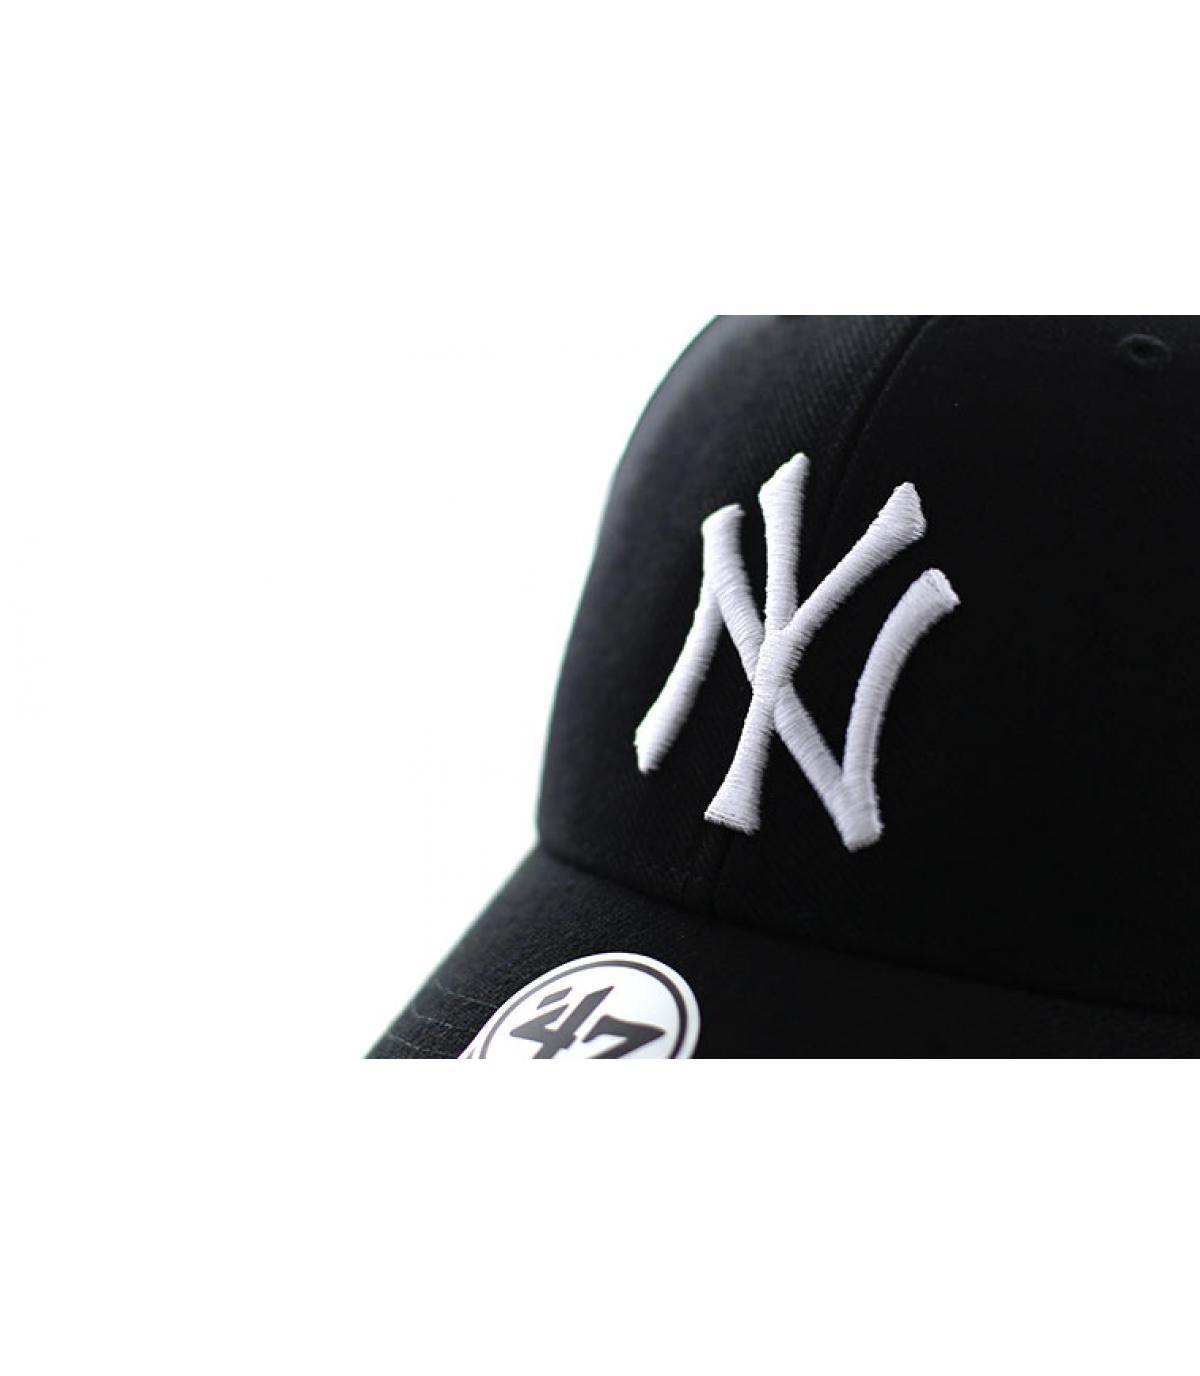 Détails MVP NY Yankees black - image 3